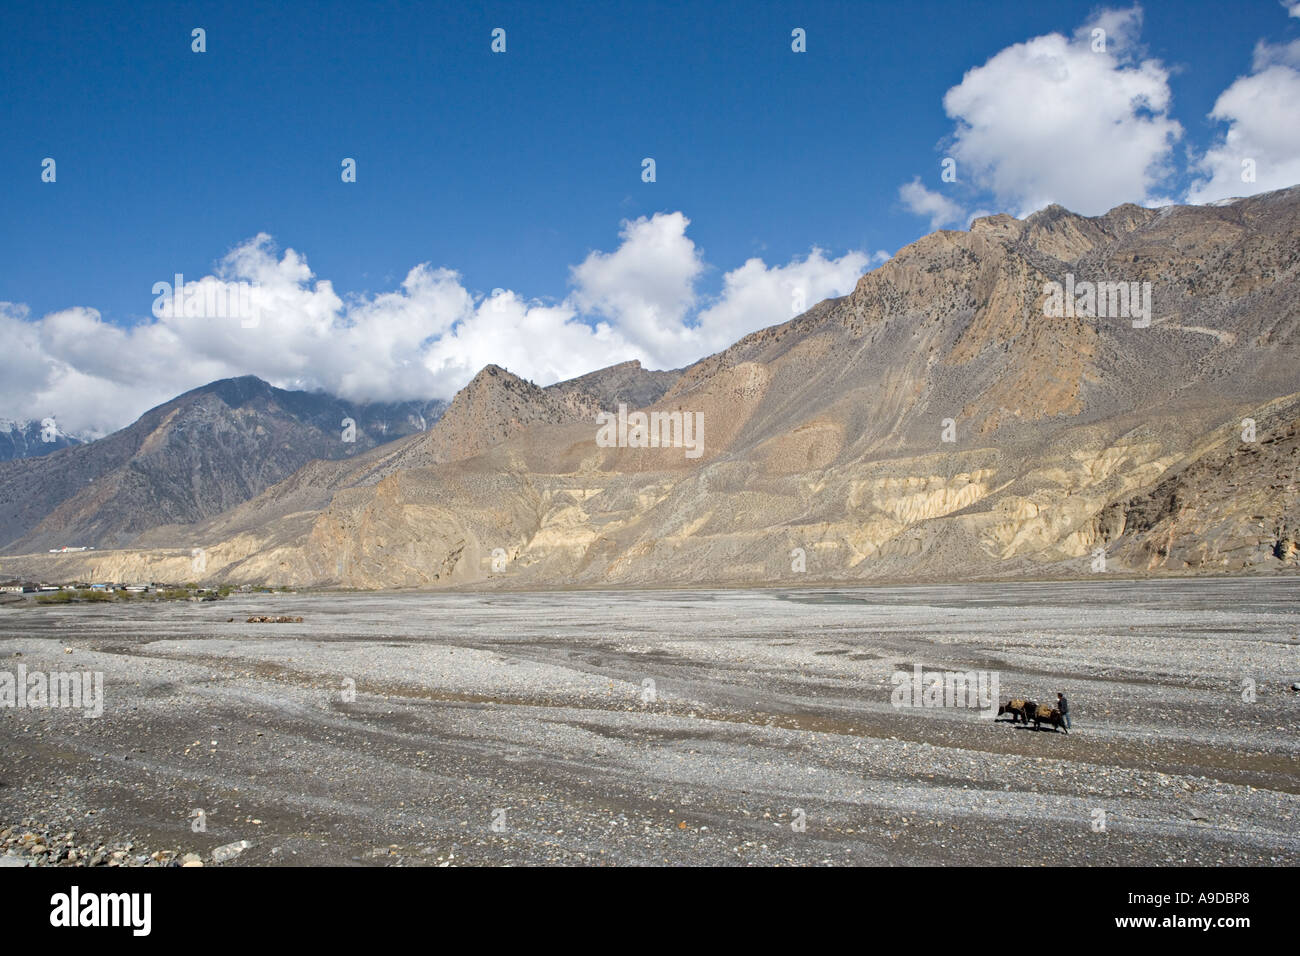 Annapurna circuit trek in Nepal - Stock Image